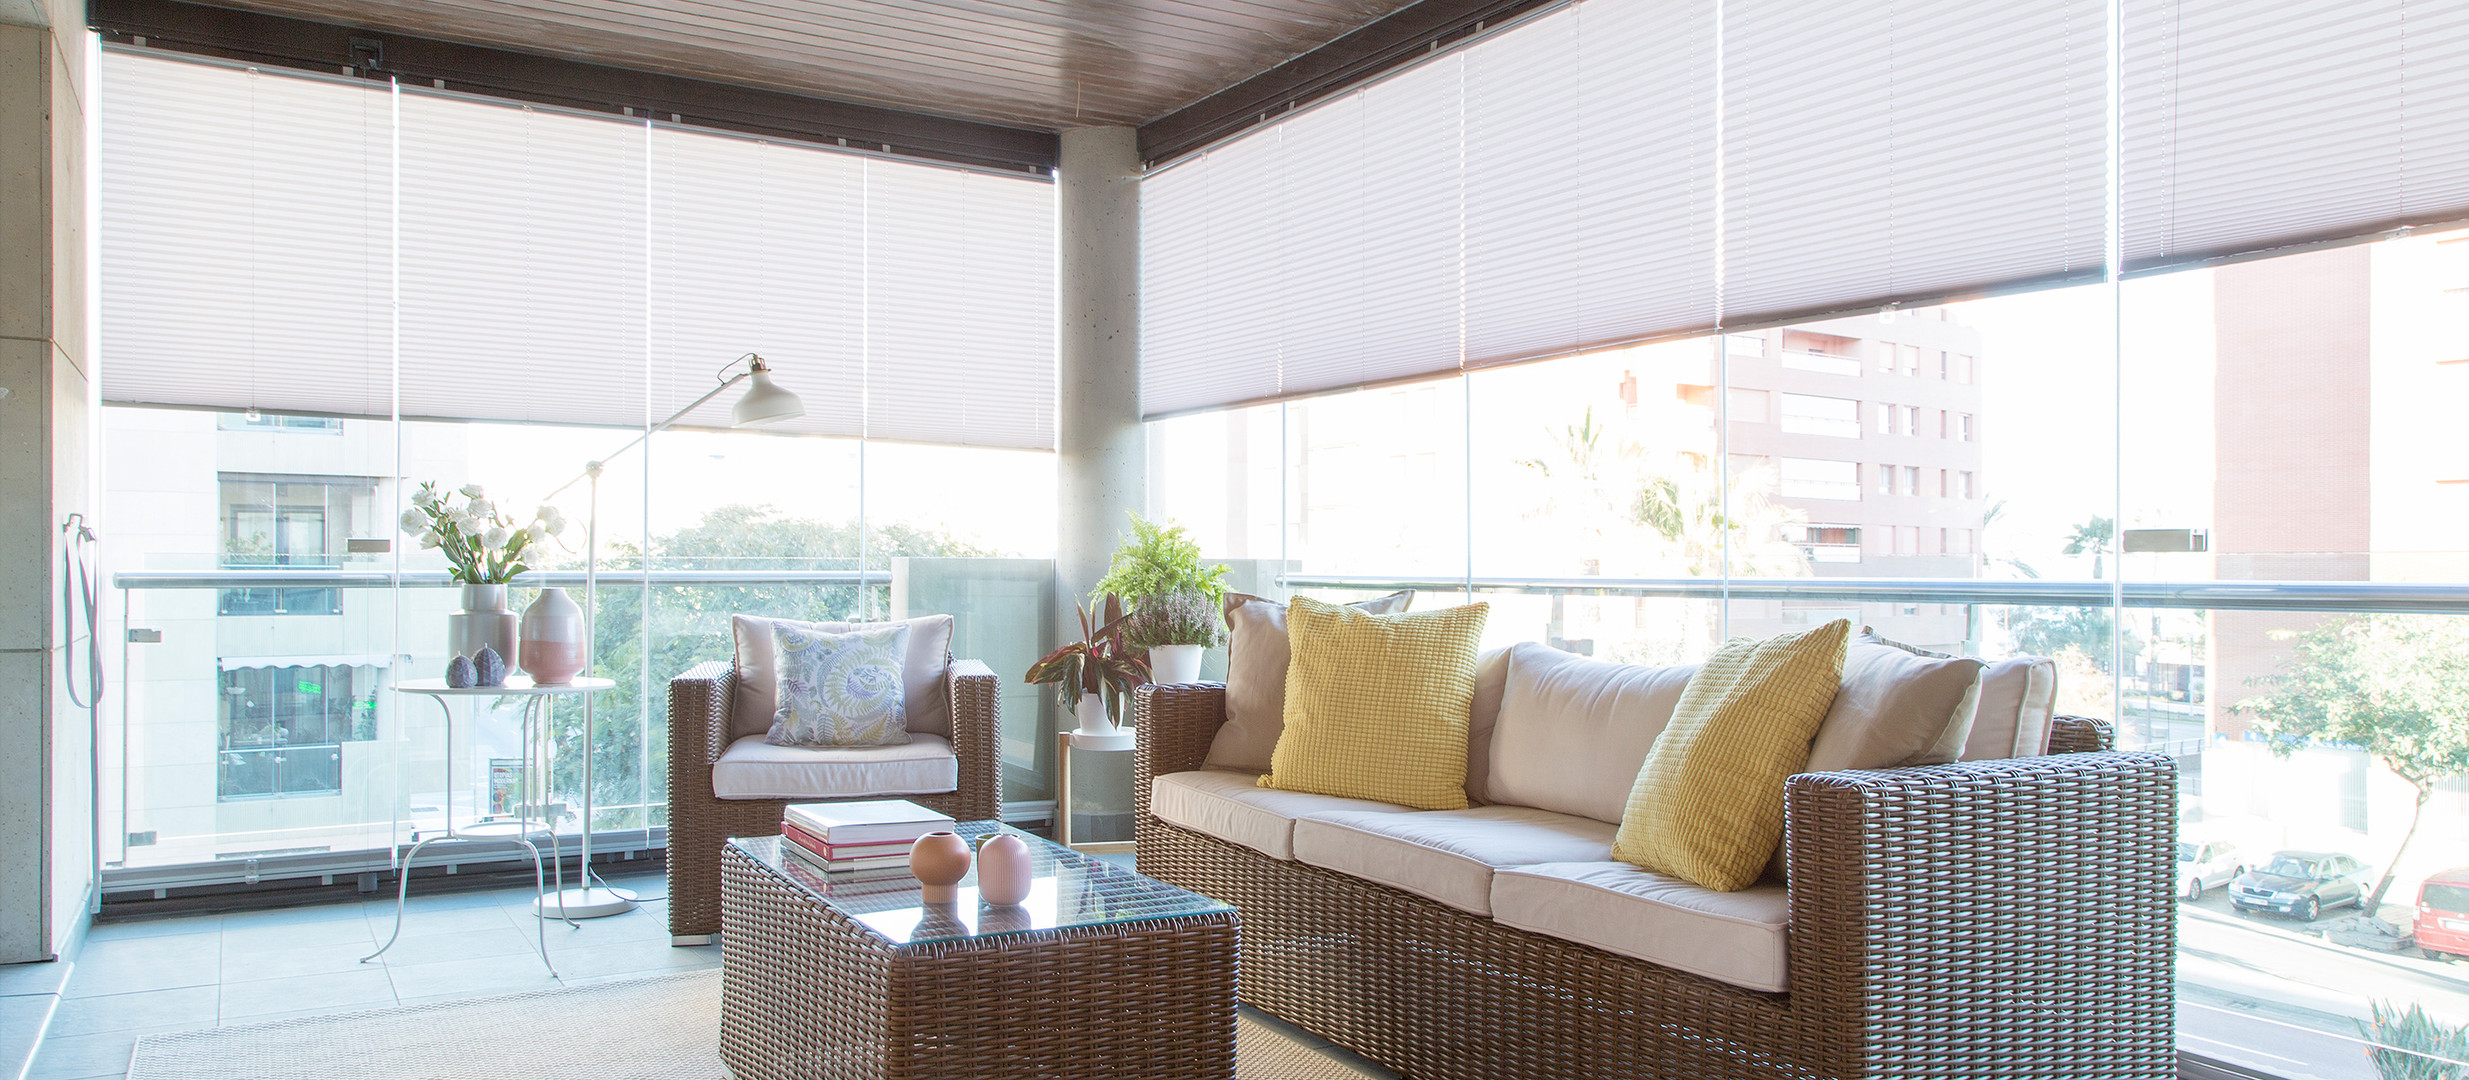 lumon-balcony-glass-004.jpg